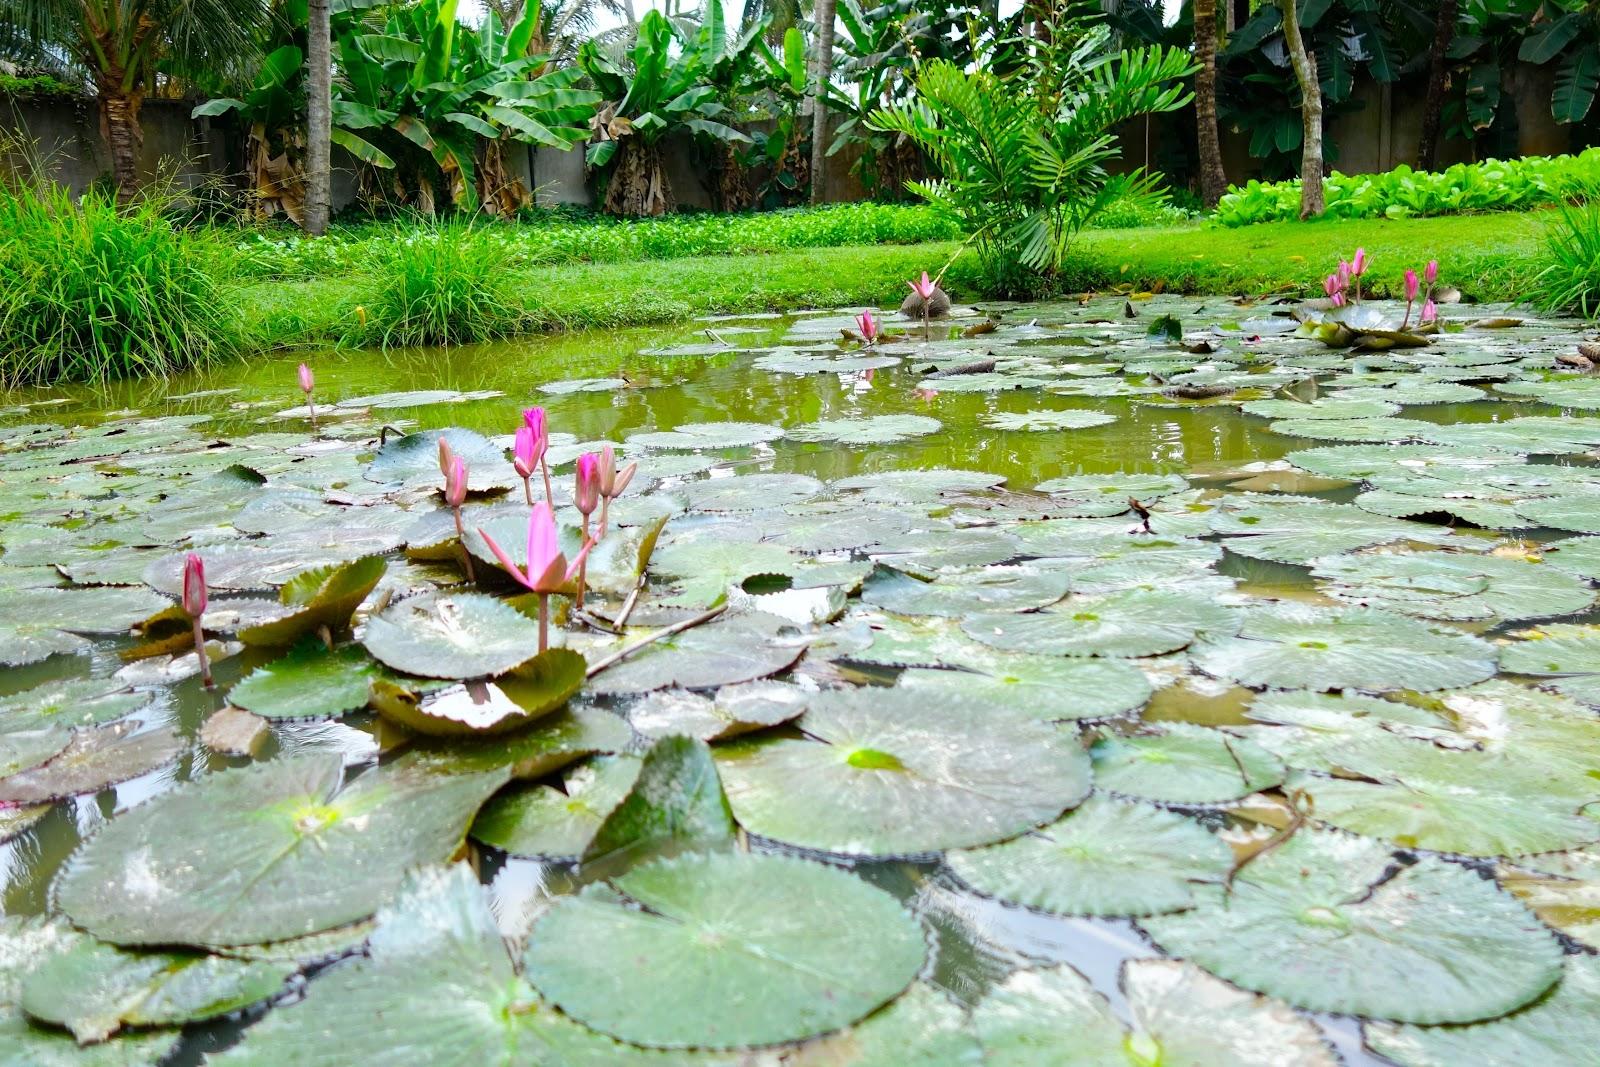 Lotus Pond Mekong Delta Vietnam 2015